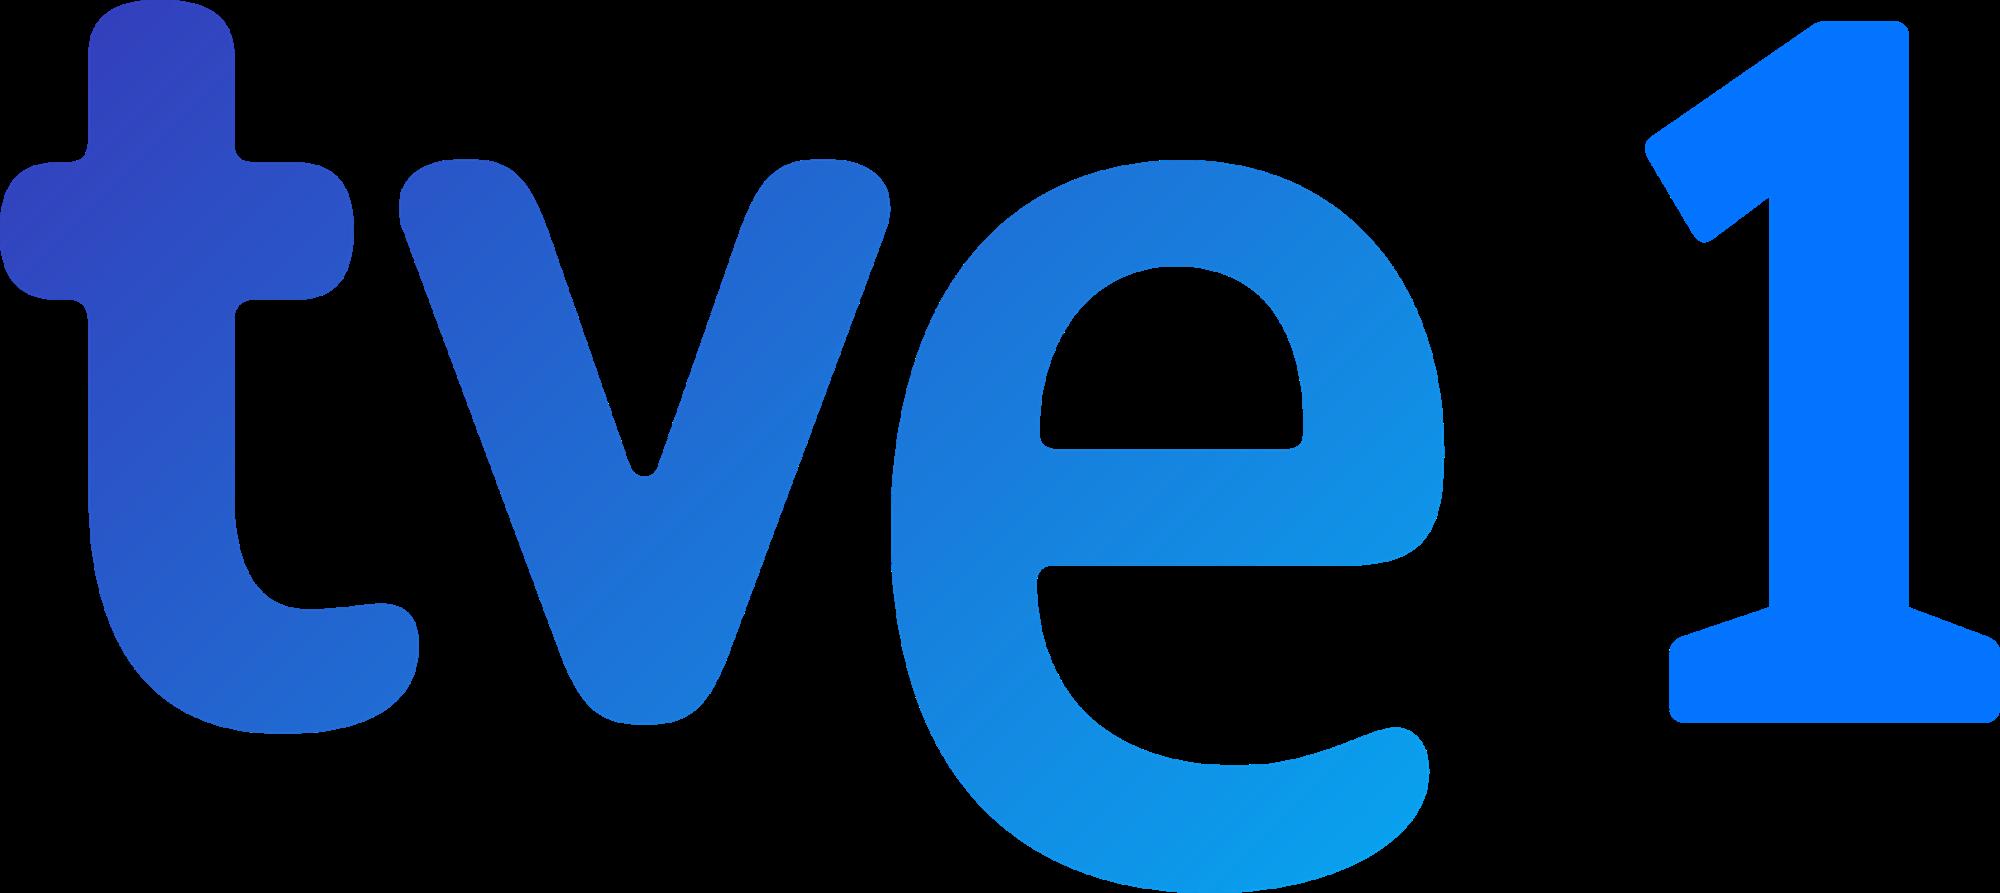 File:TVE1 logo 2008.png